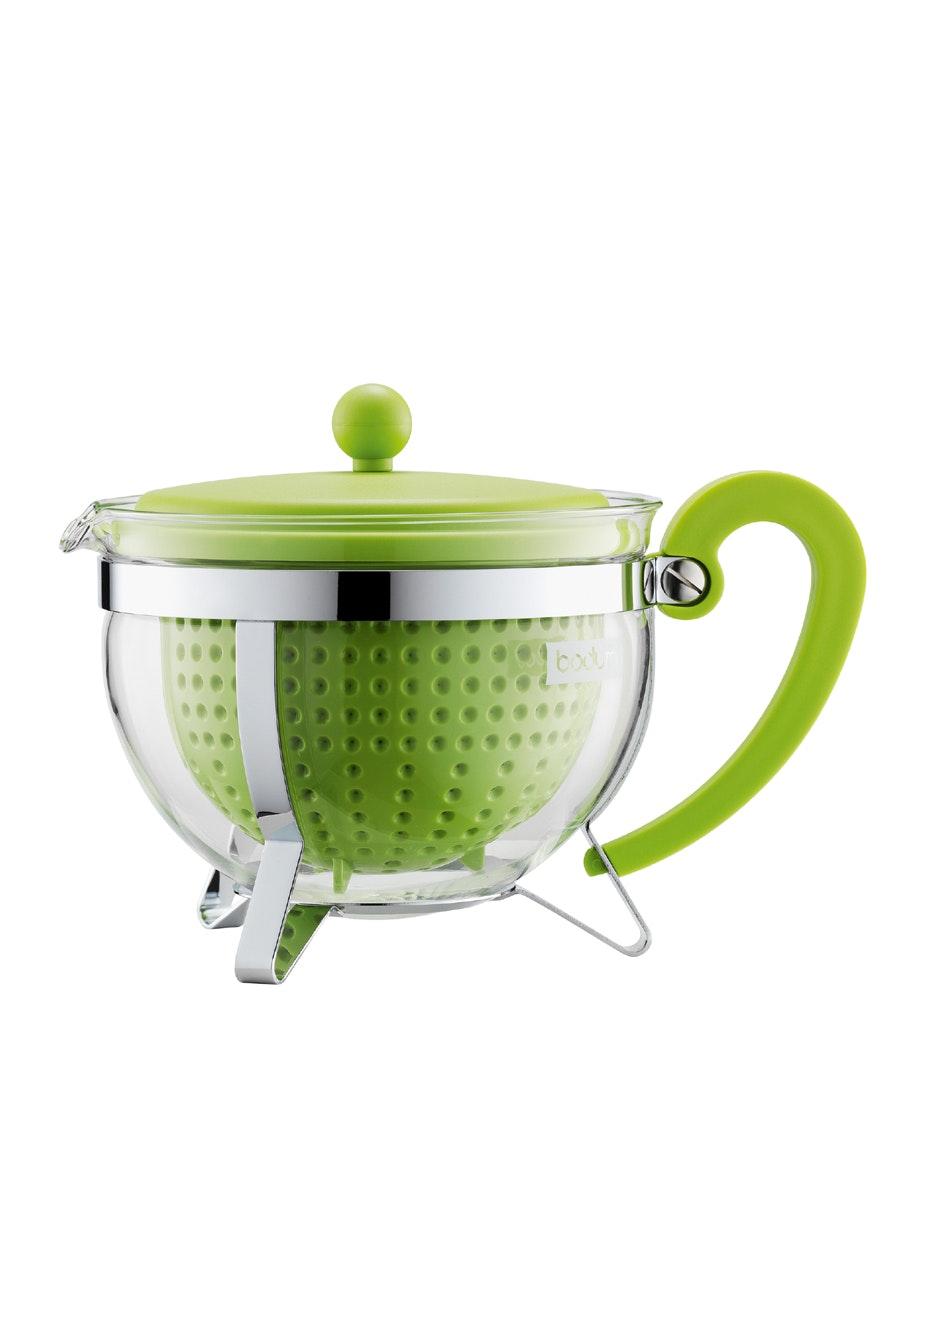 Bodum - Tea Pot, 1.3L - Lime